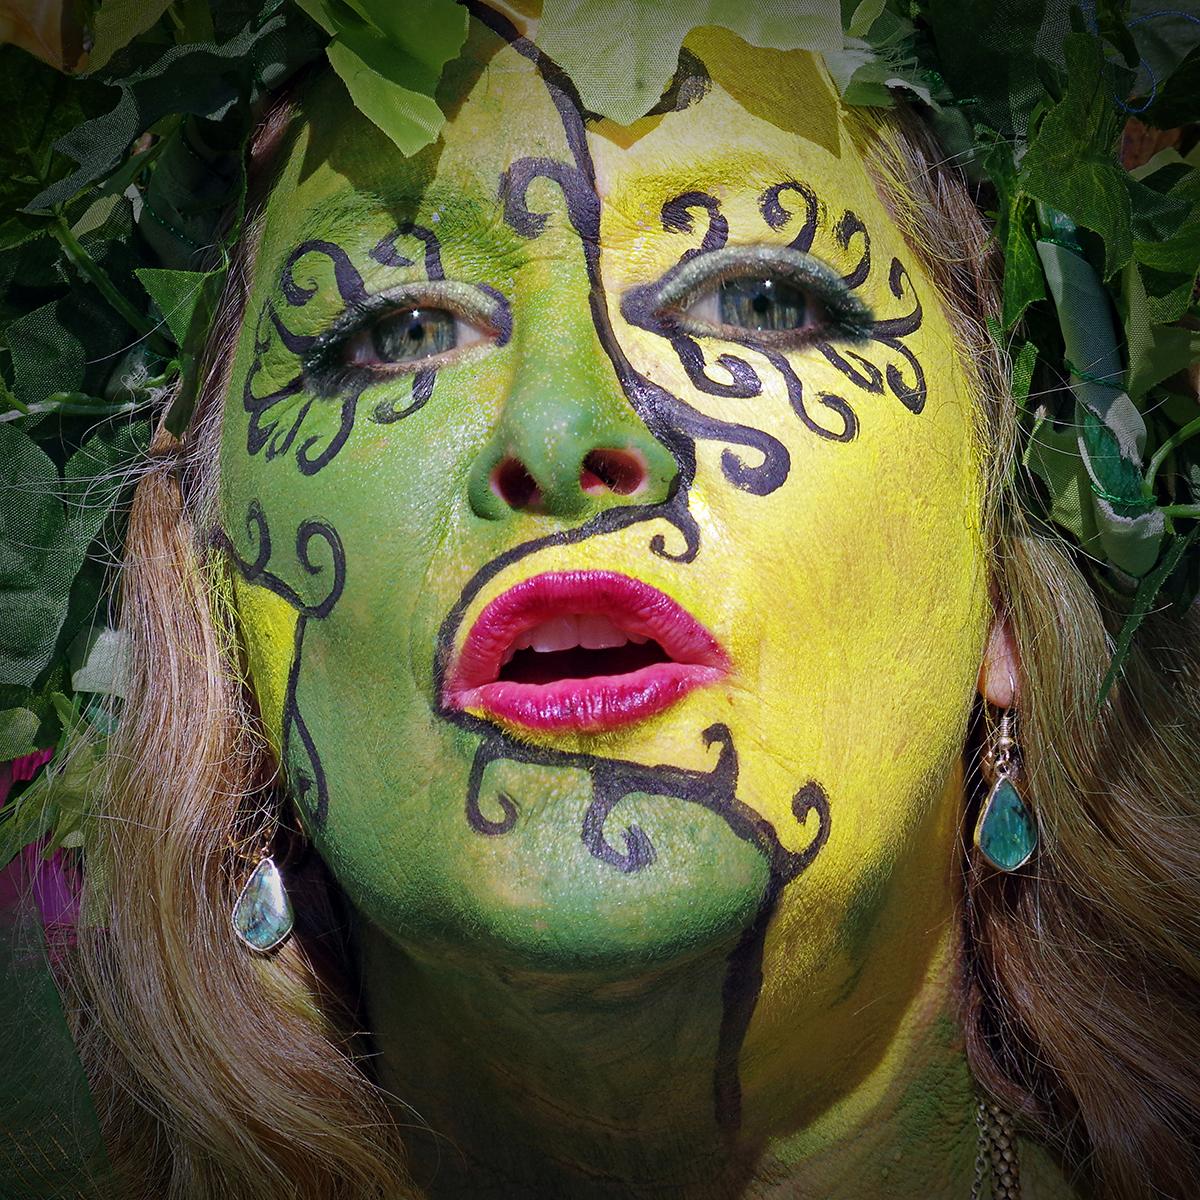 Second 'Green Man Festival 03' by Richard Ramsay